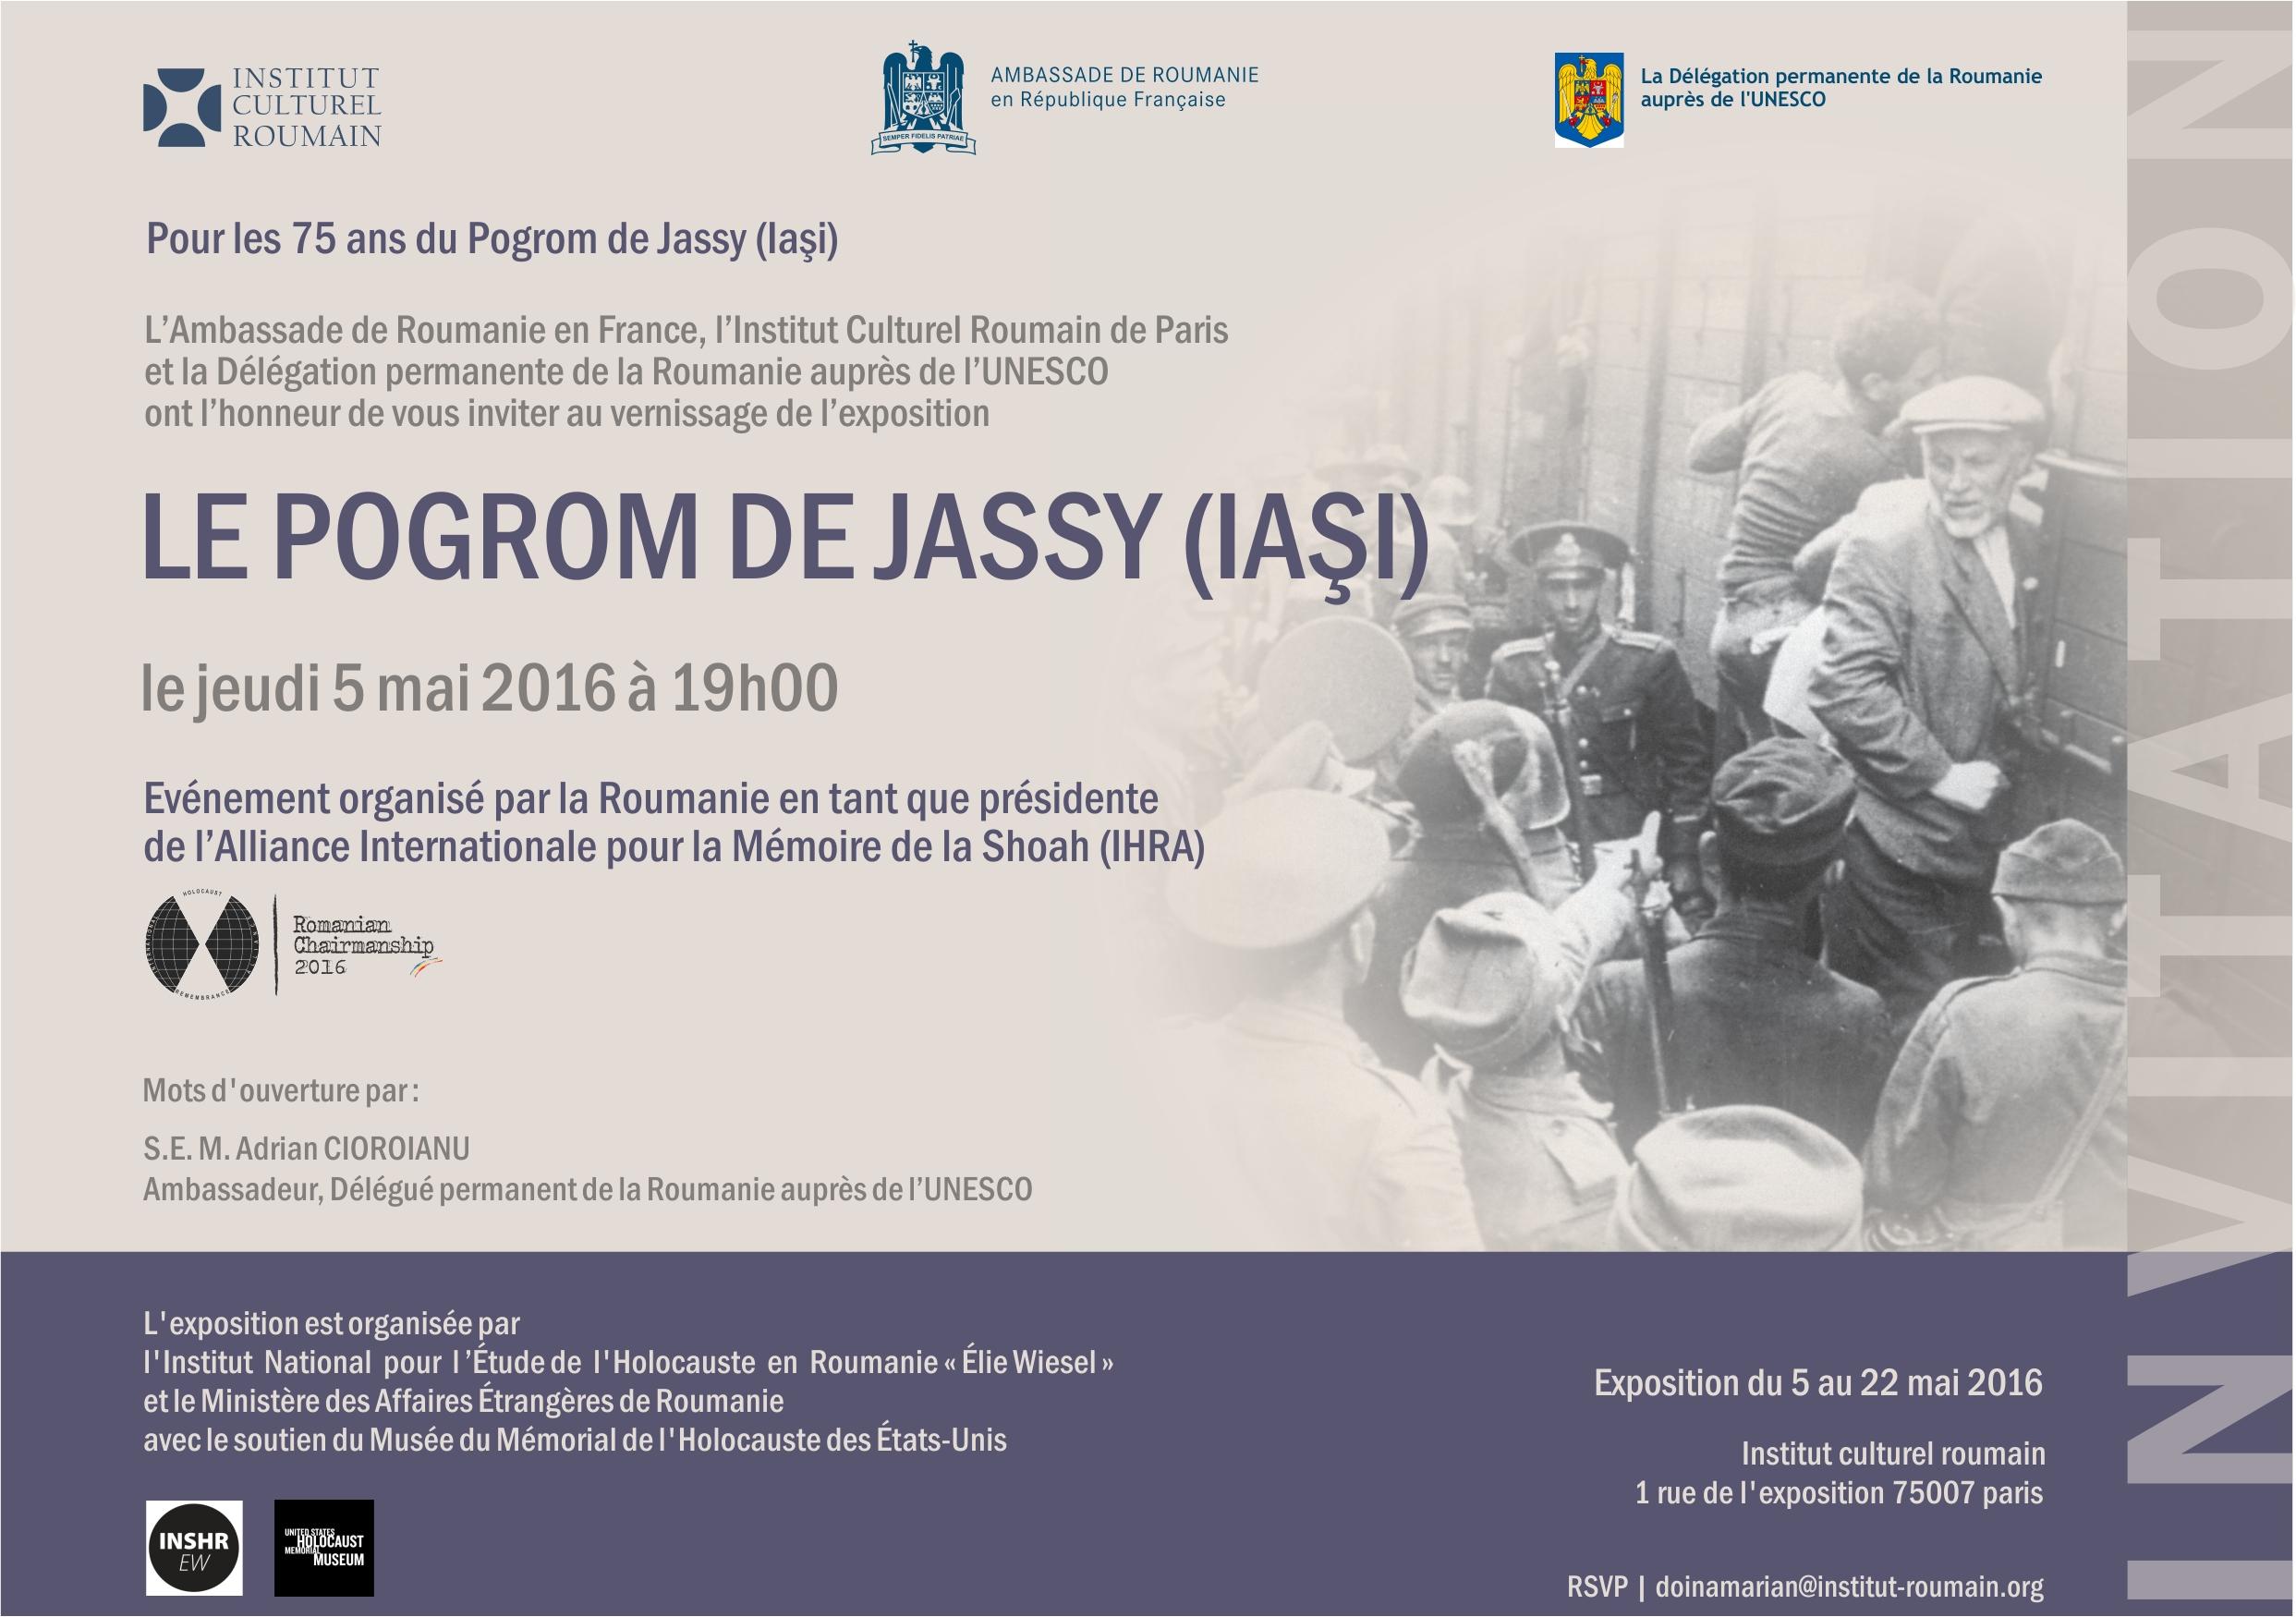 https://i1.wp.com/www.justitiarul.ro/wp-content/uploads/2017/05/ambasada-Paris-pogrom-Iasi-1.jpg